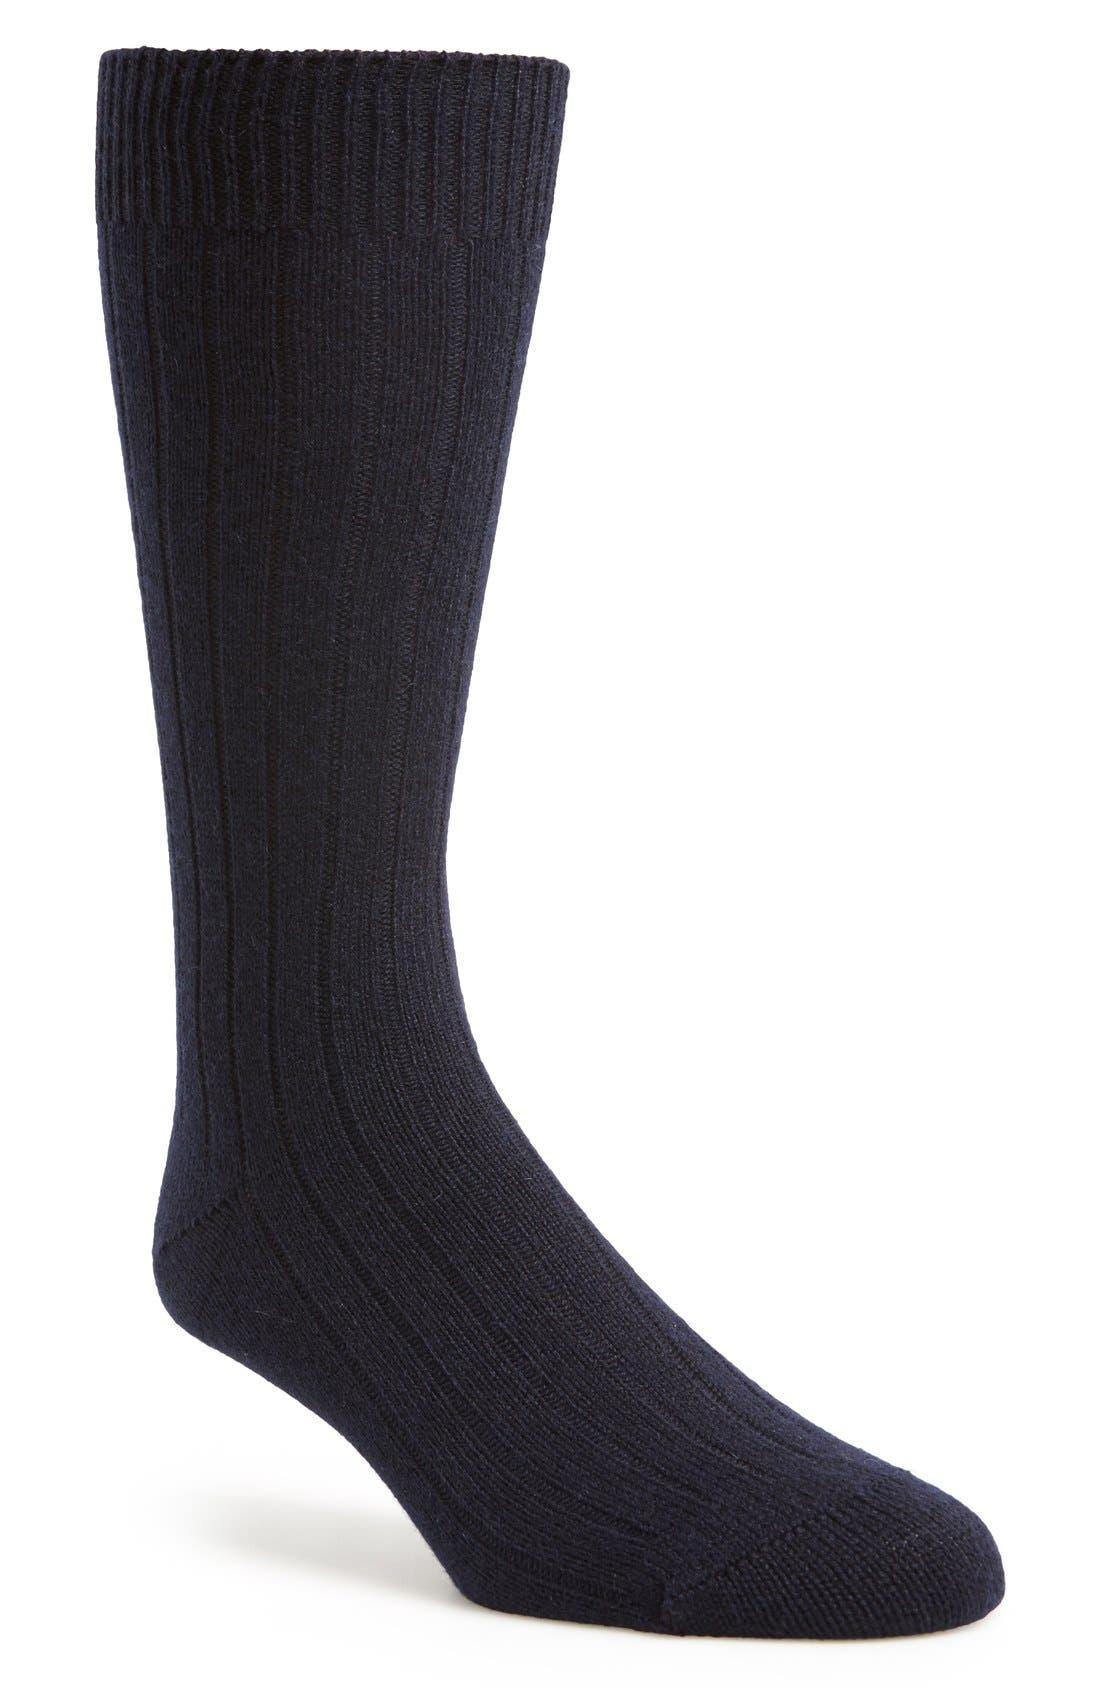 'Waddington' Cashmere Blend Mid Calf Socks,                             Main thumbnail 1, color,                             Navy